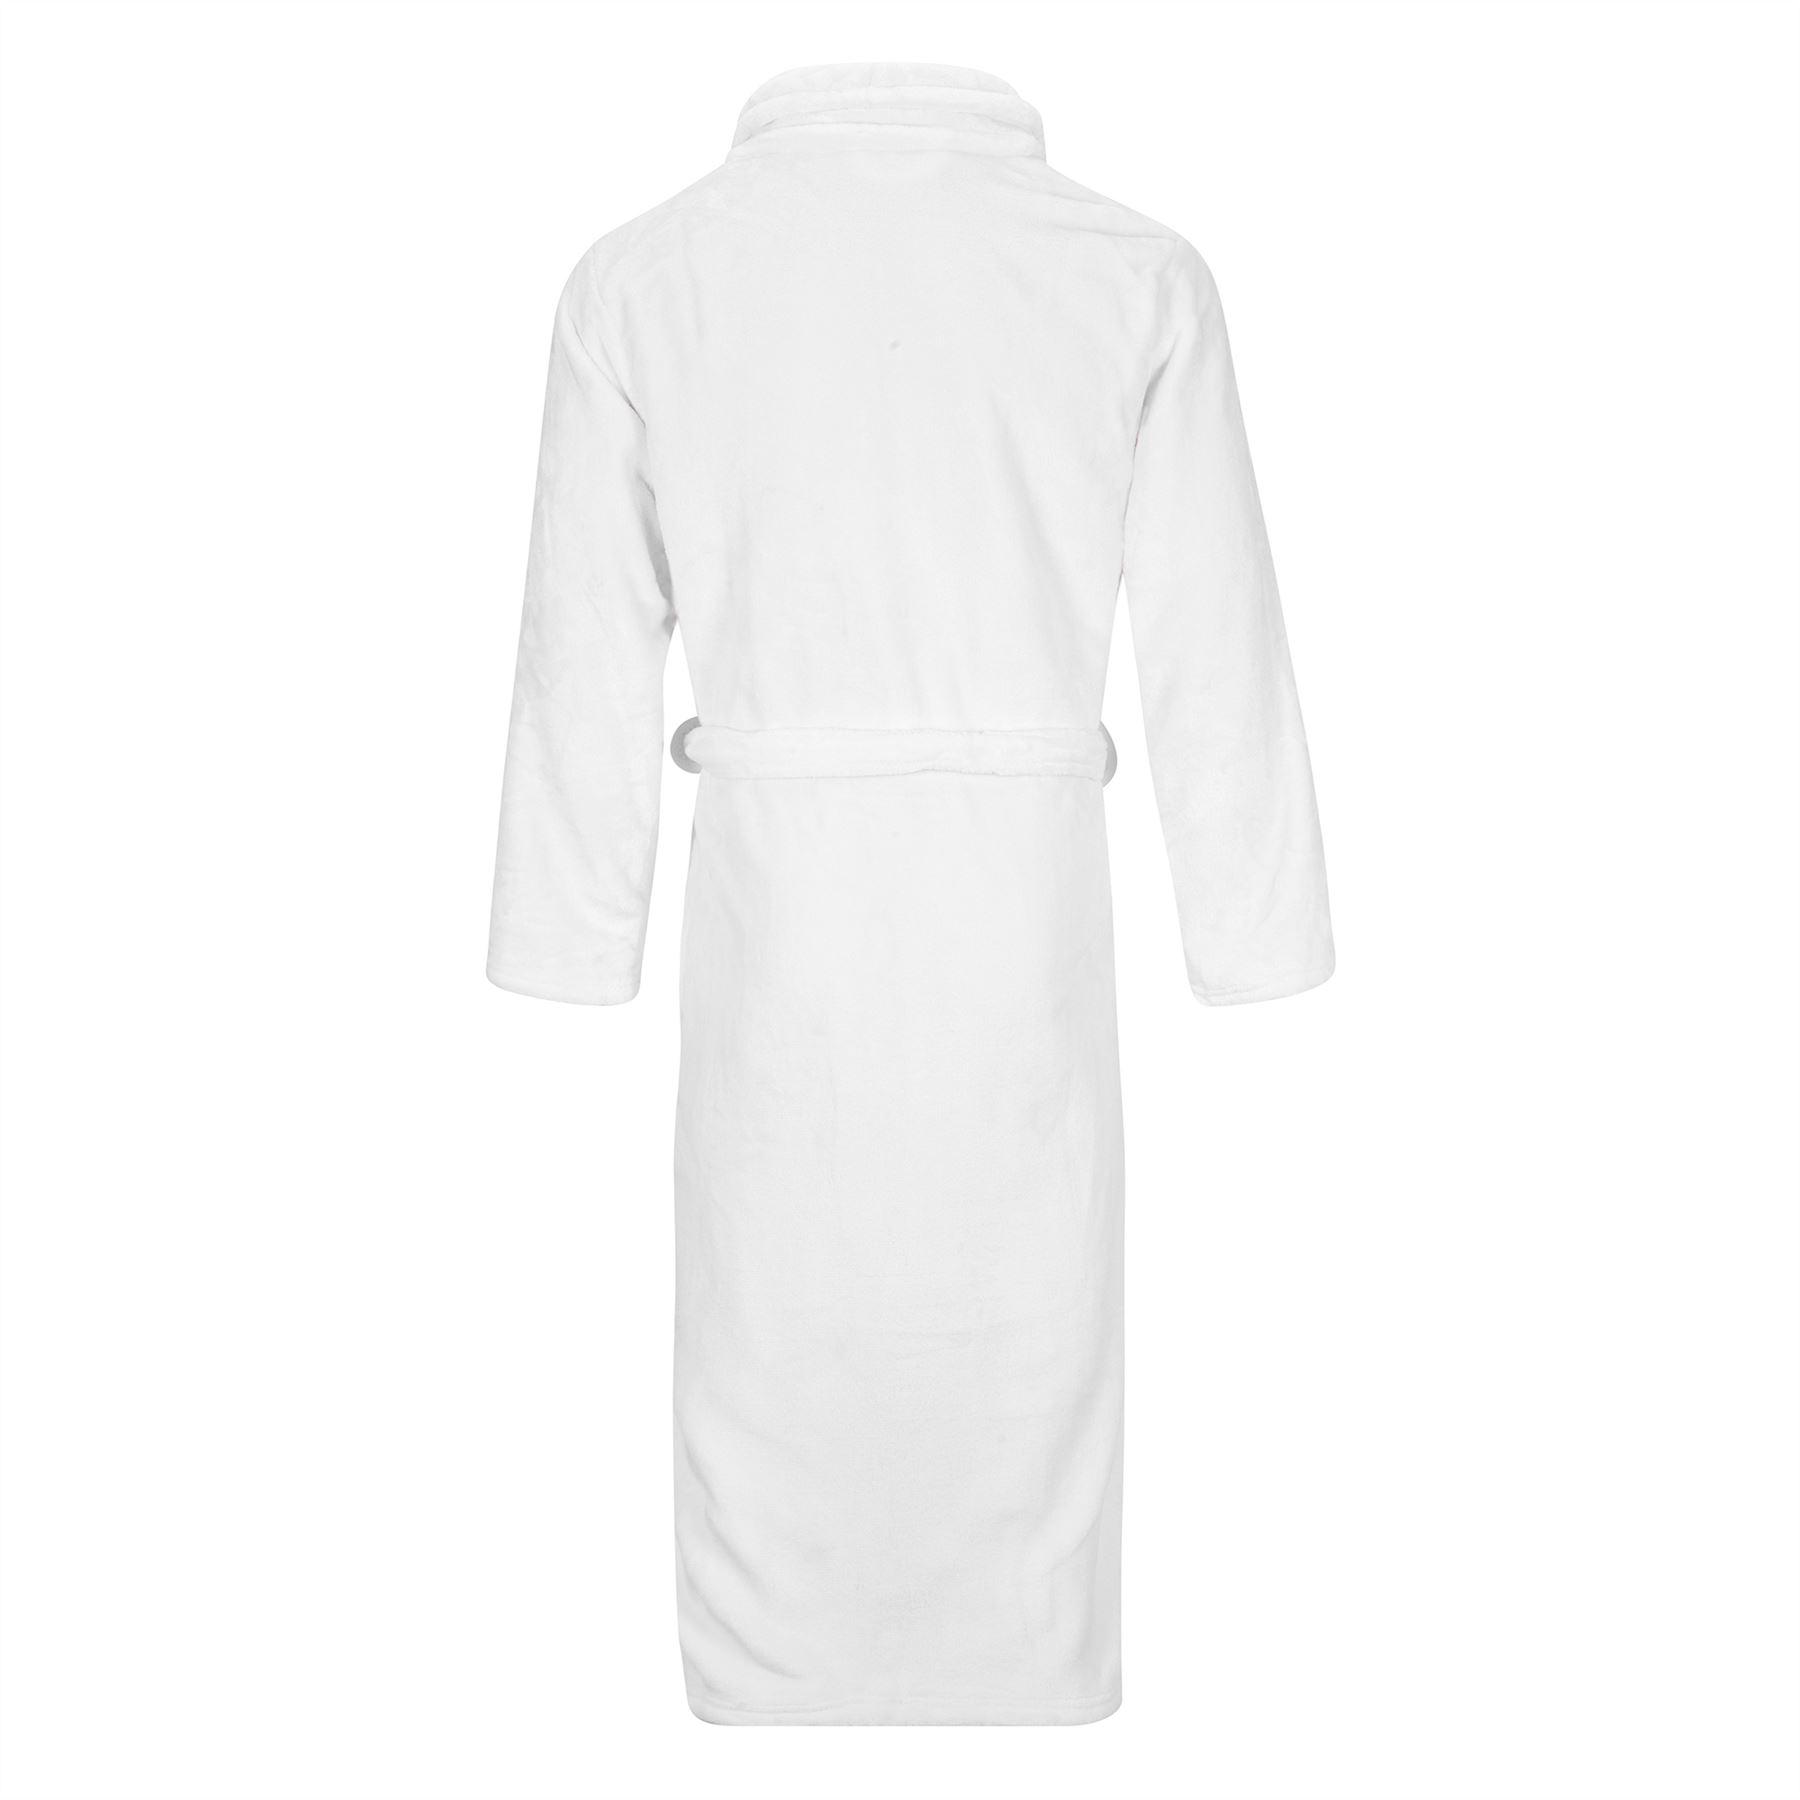 White Unisex Silk Touch Fleece Bathrobe Dressing Gown Mens